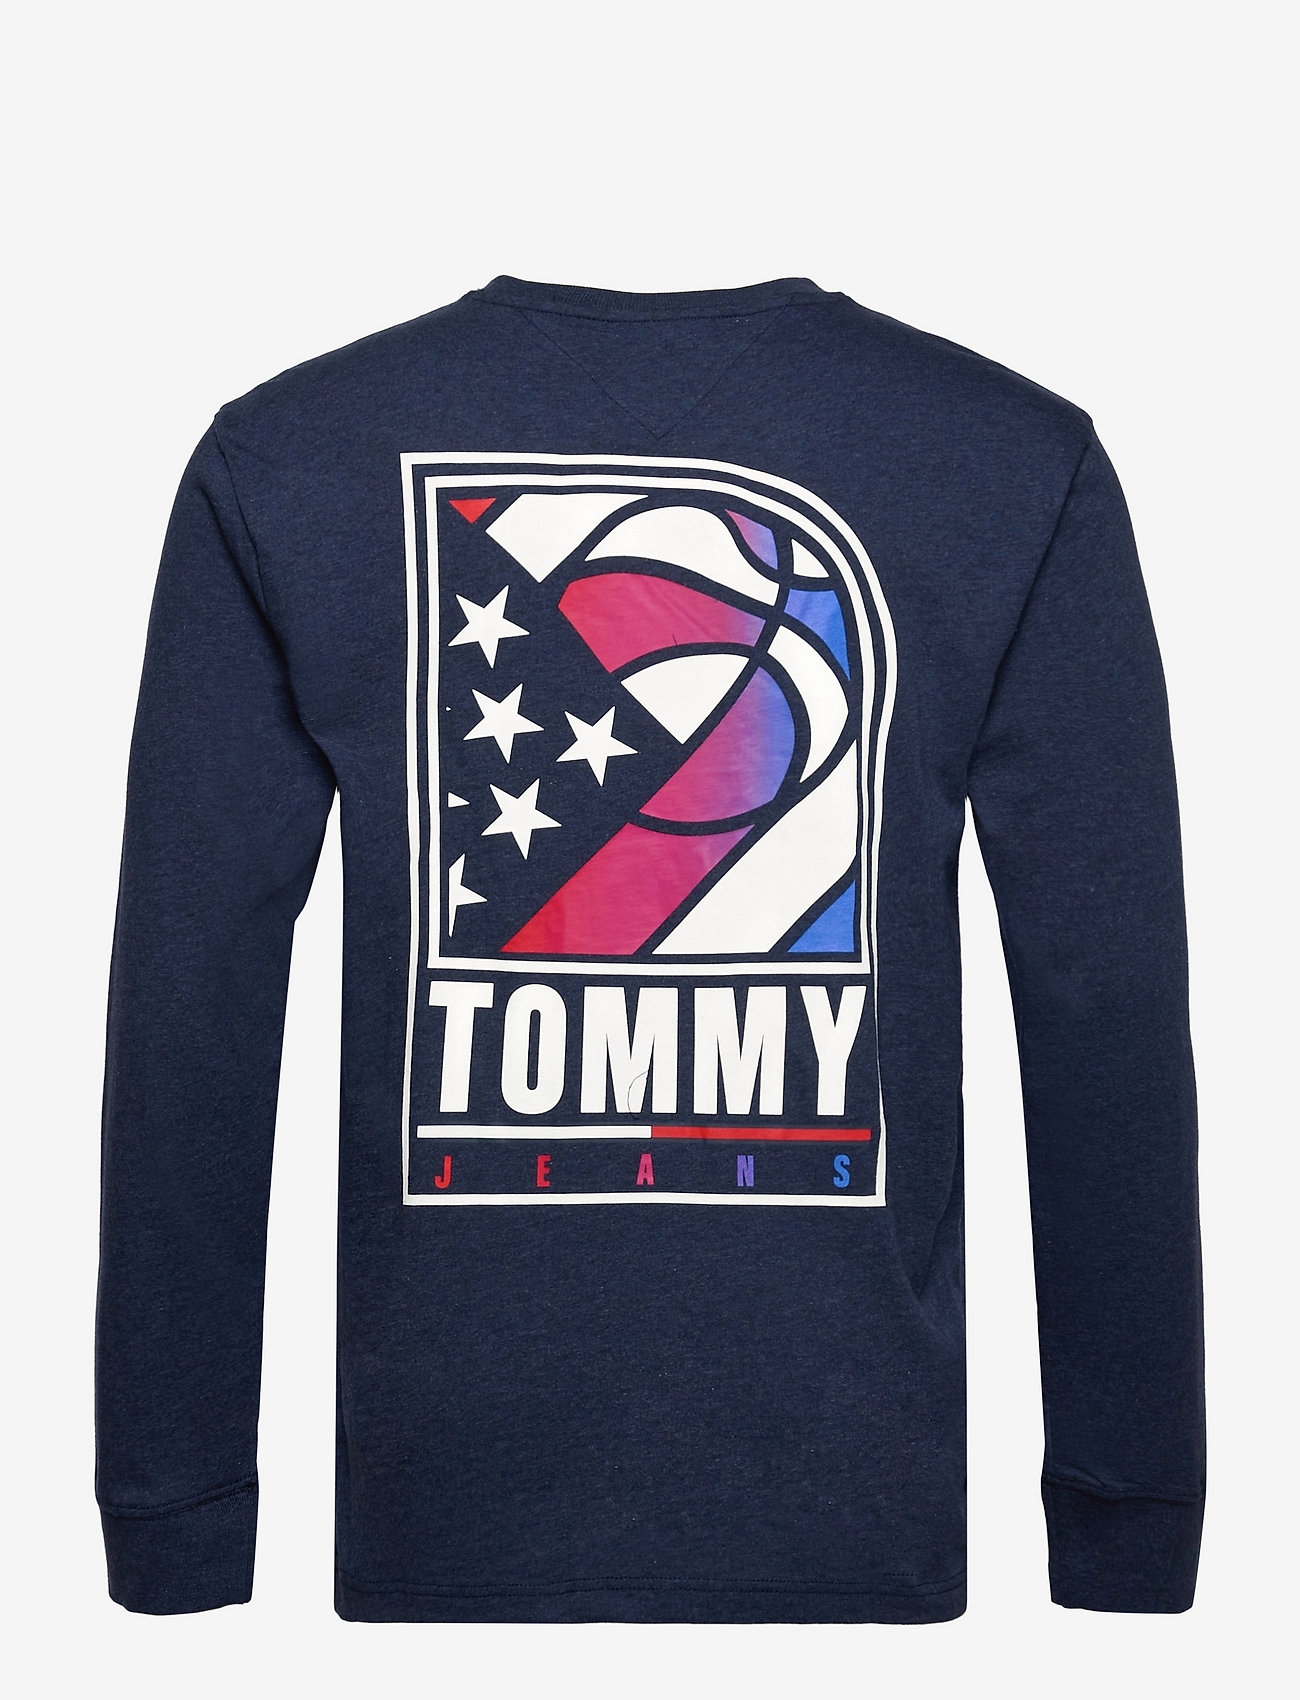 Tommy Jeans - TJM TOMMY BASKETBALL LONGSLEEVE - basic t-shirts - twilight navy - 1